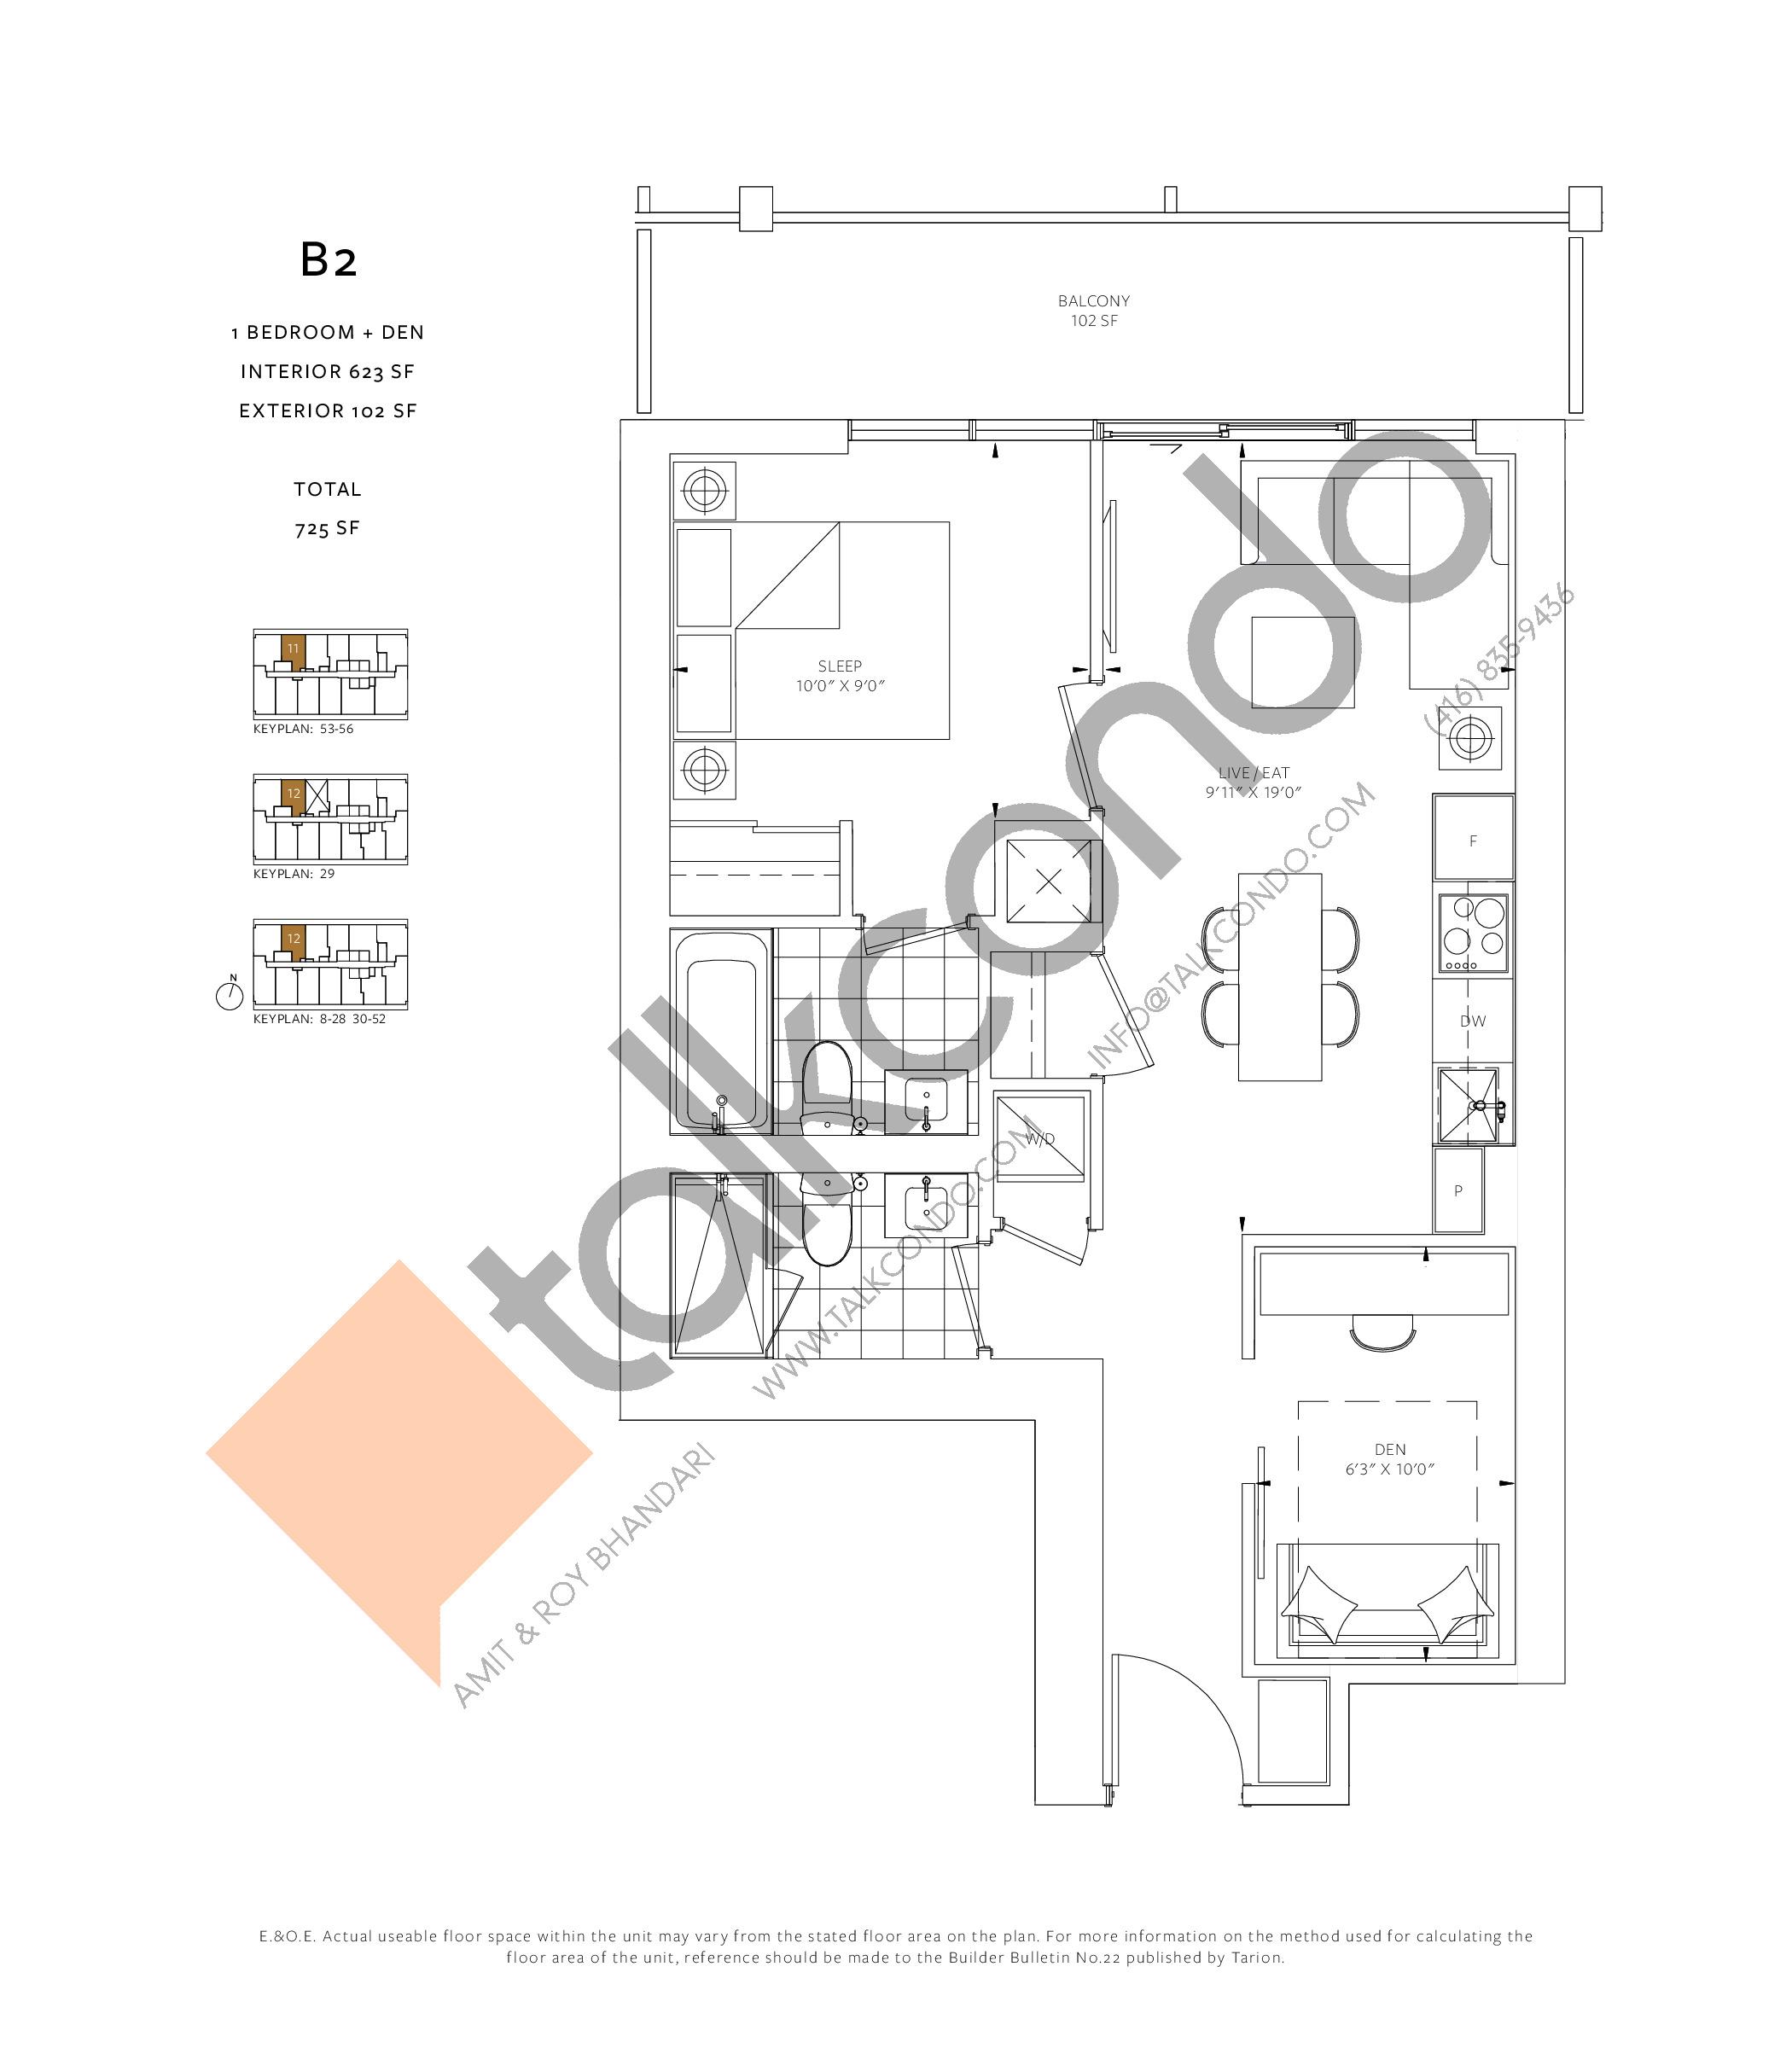 B2 Floor Plan at 88 Queen Condos - 623 sq.ft